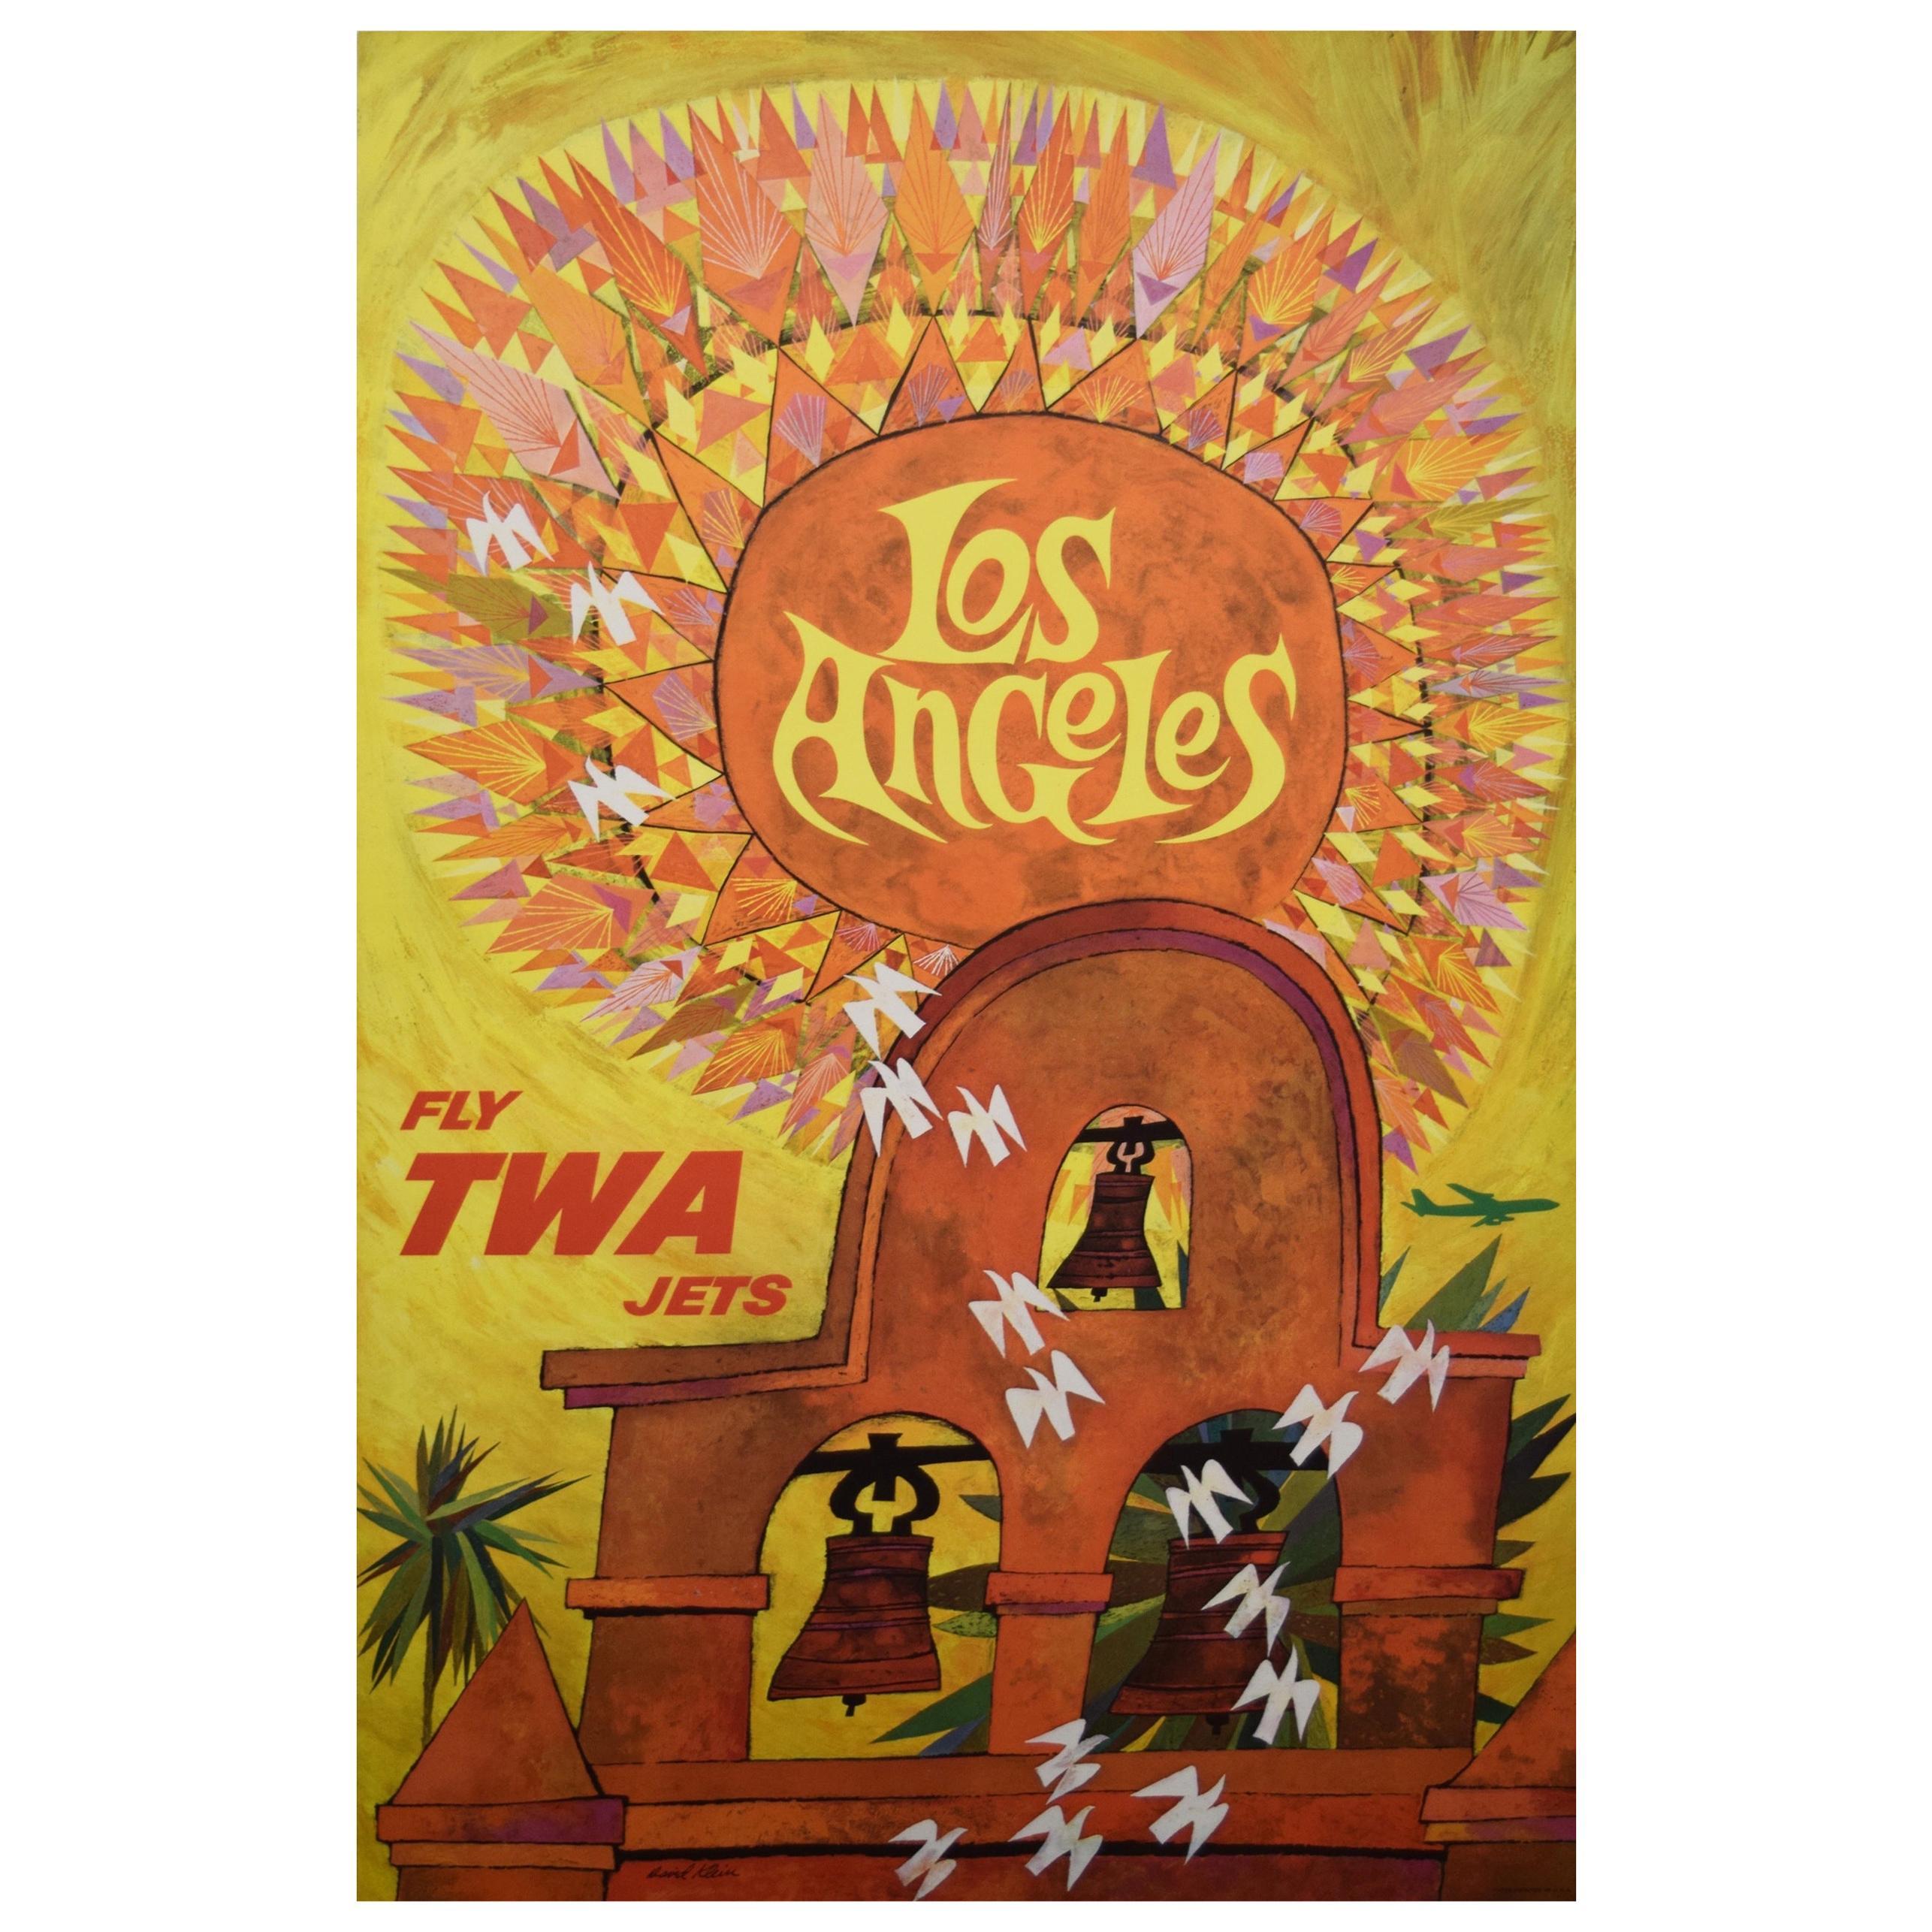 TWA Los Angeles 1960s Travel Poster, Klein